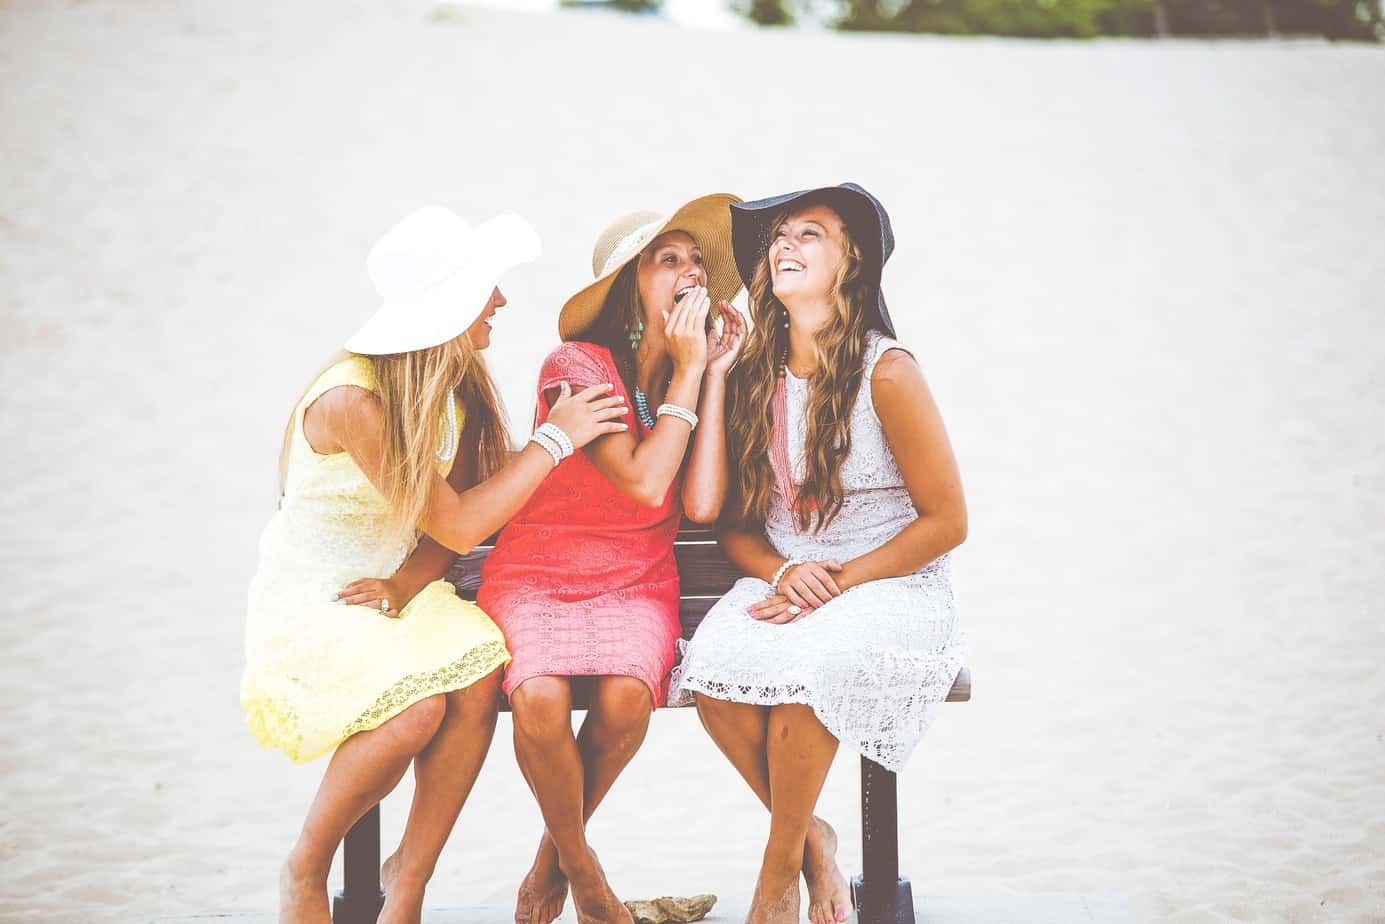 TalkInFrench.com girls laughing